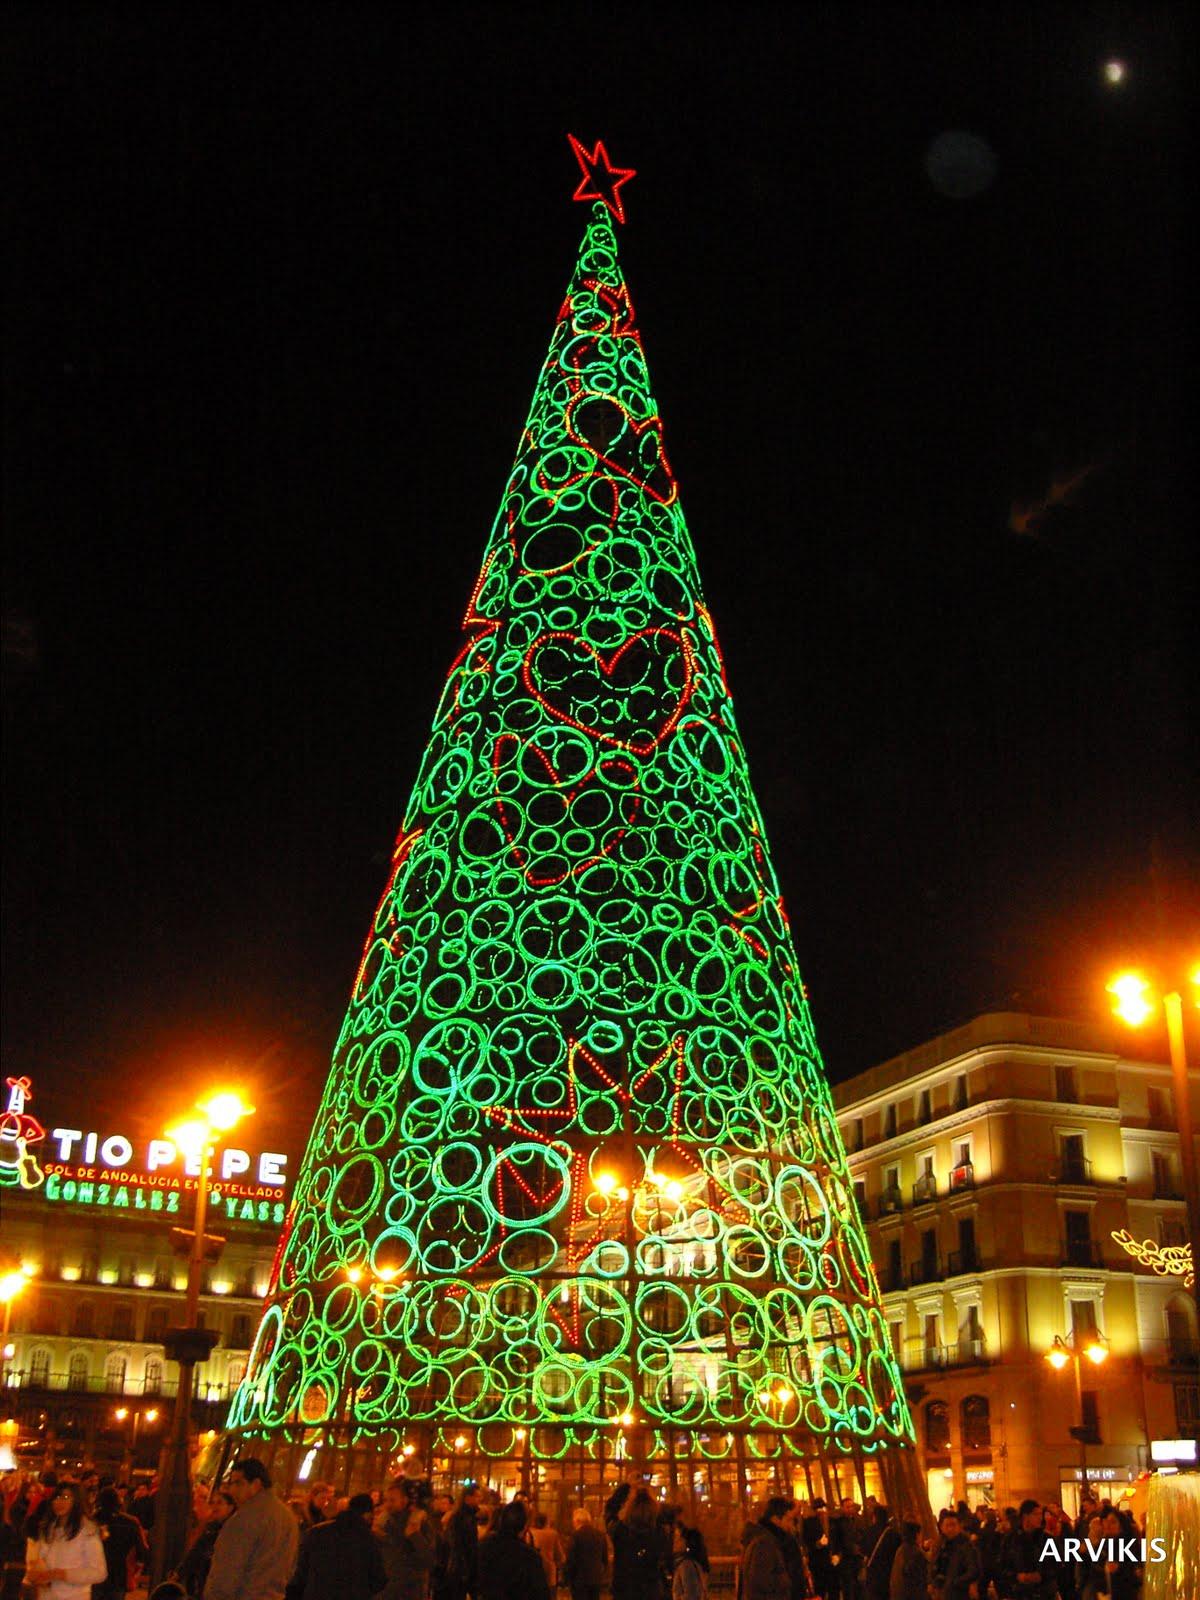 Arvikis madrid hoy se encendi la navidad en madrid for Puerta del sol hoy